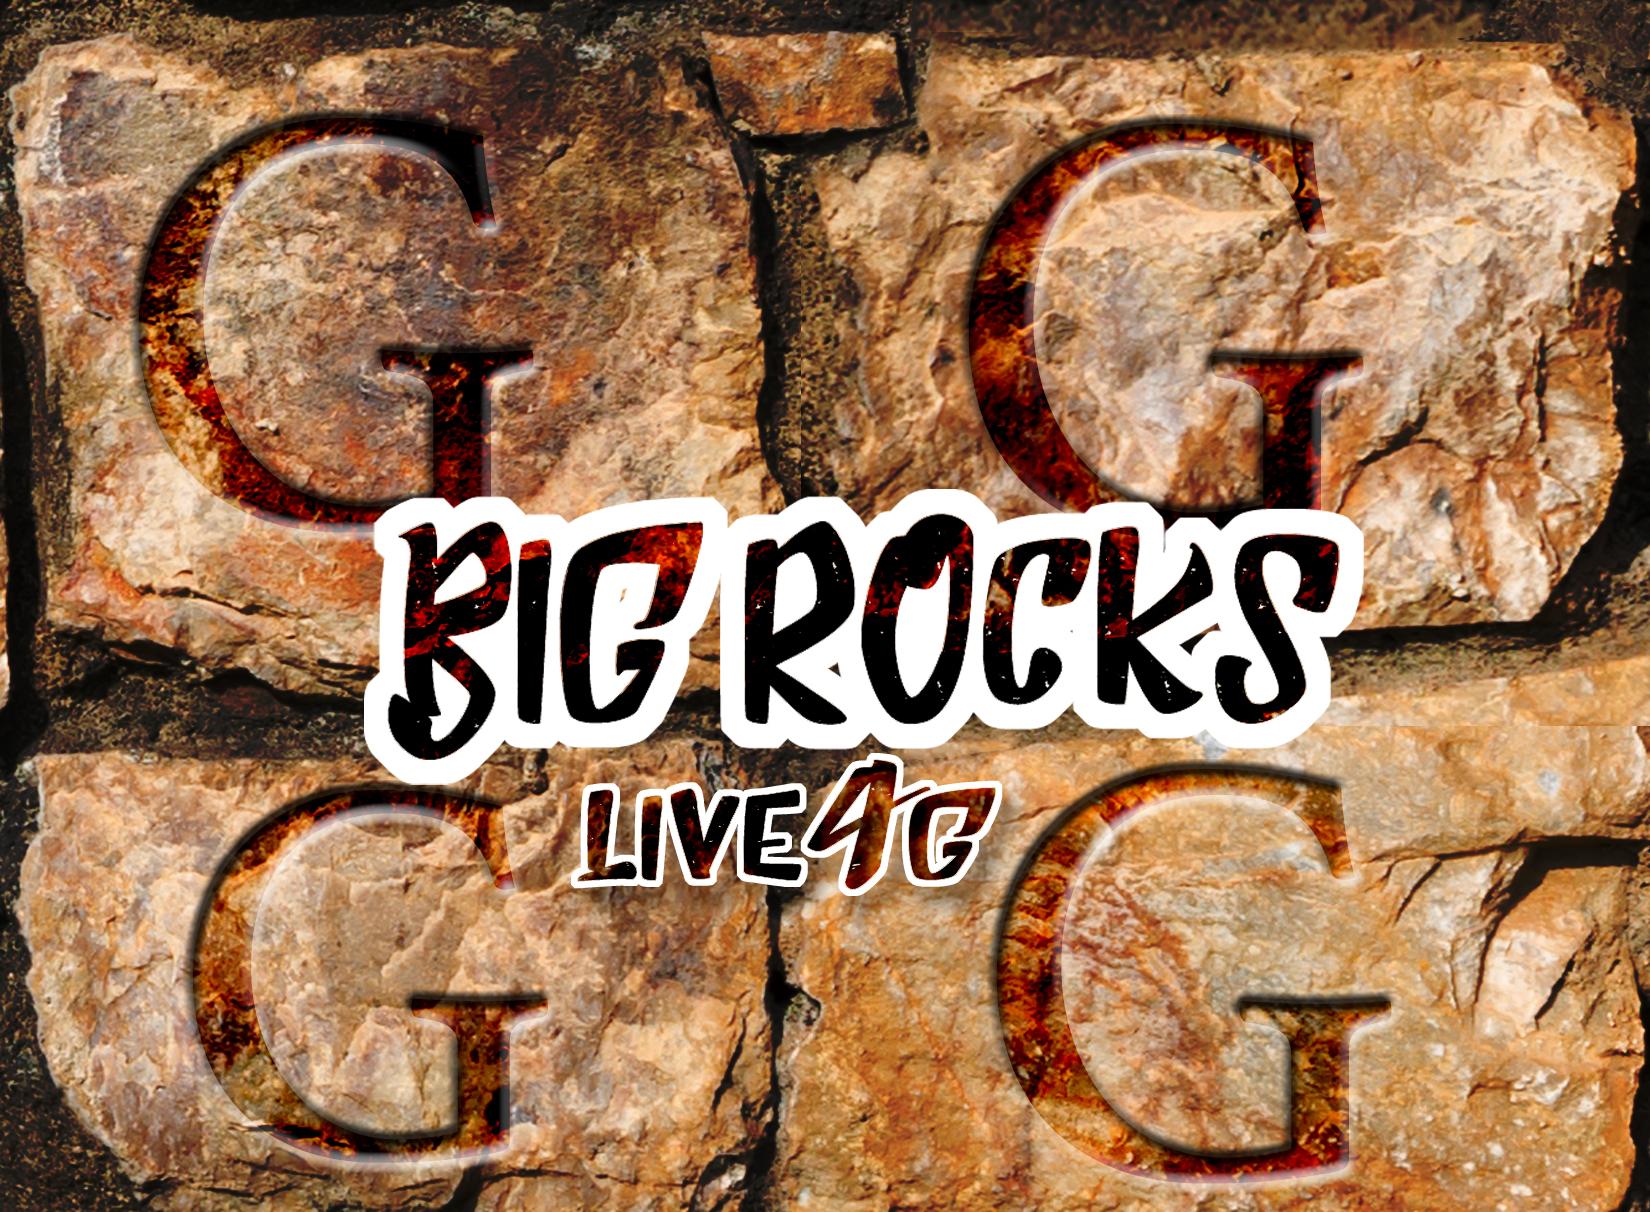 BIGROCKS_Live4G.jpg